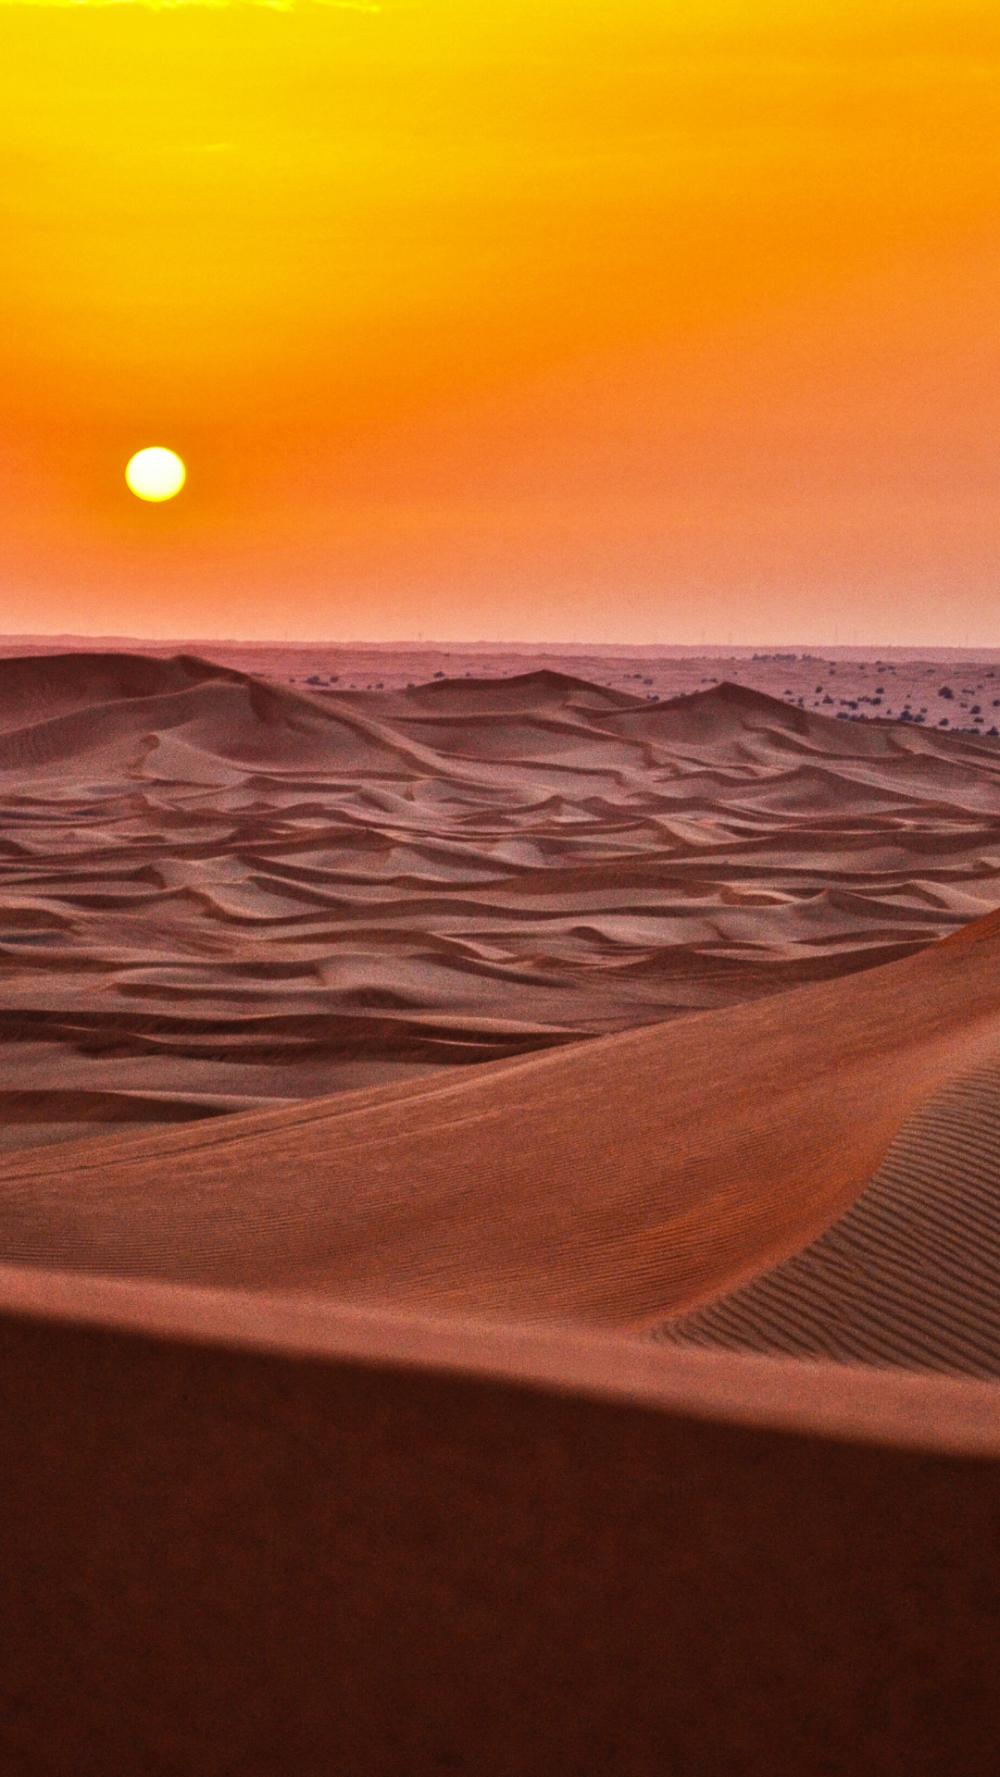 Sandscape iPhone Wallpaper en 2020 (con imágenes